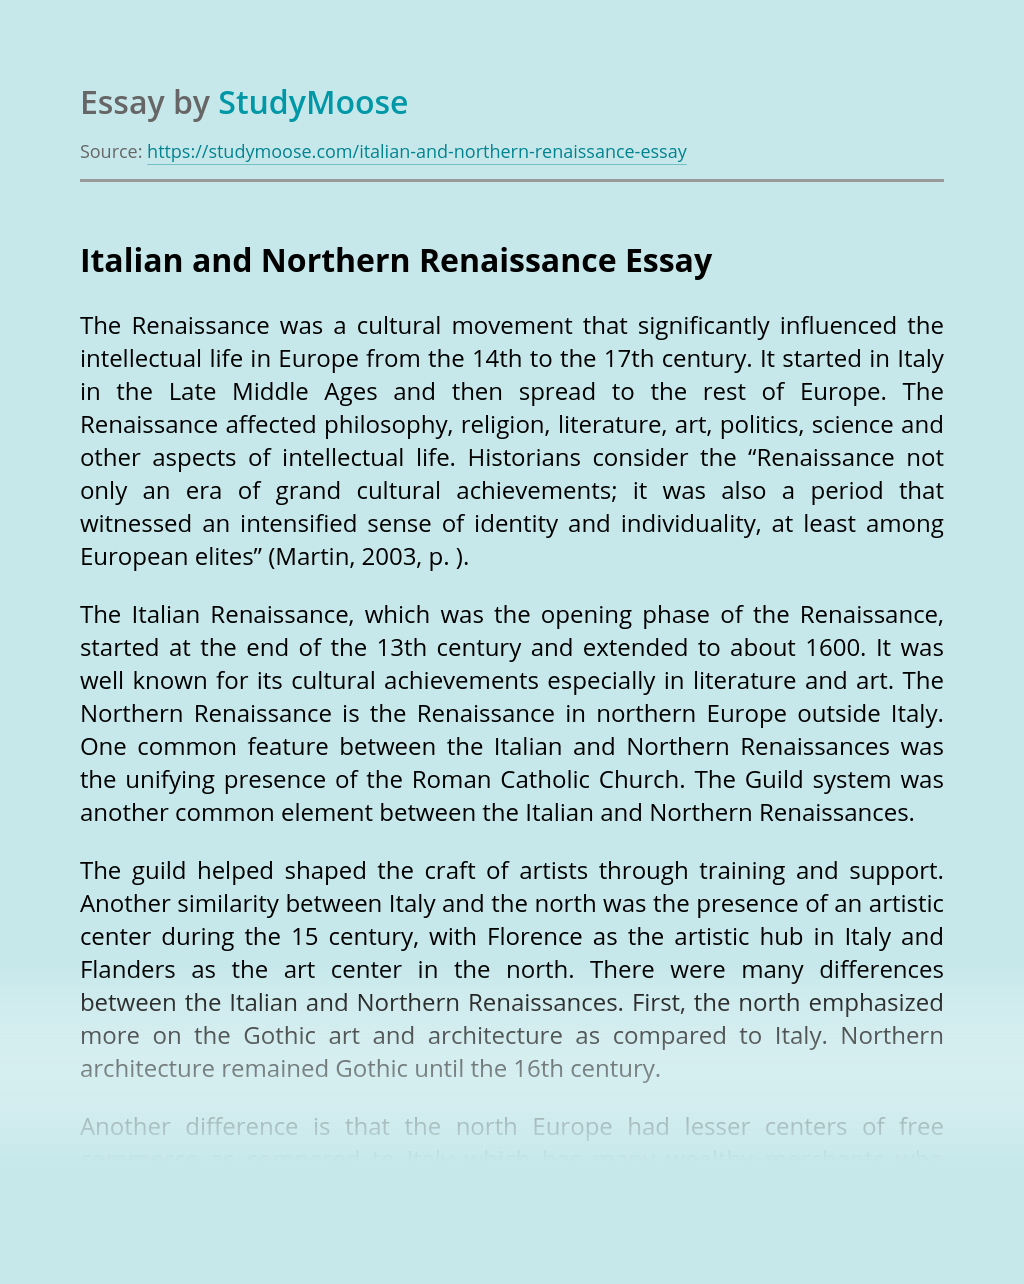 Italian and Northern Renaissance